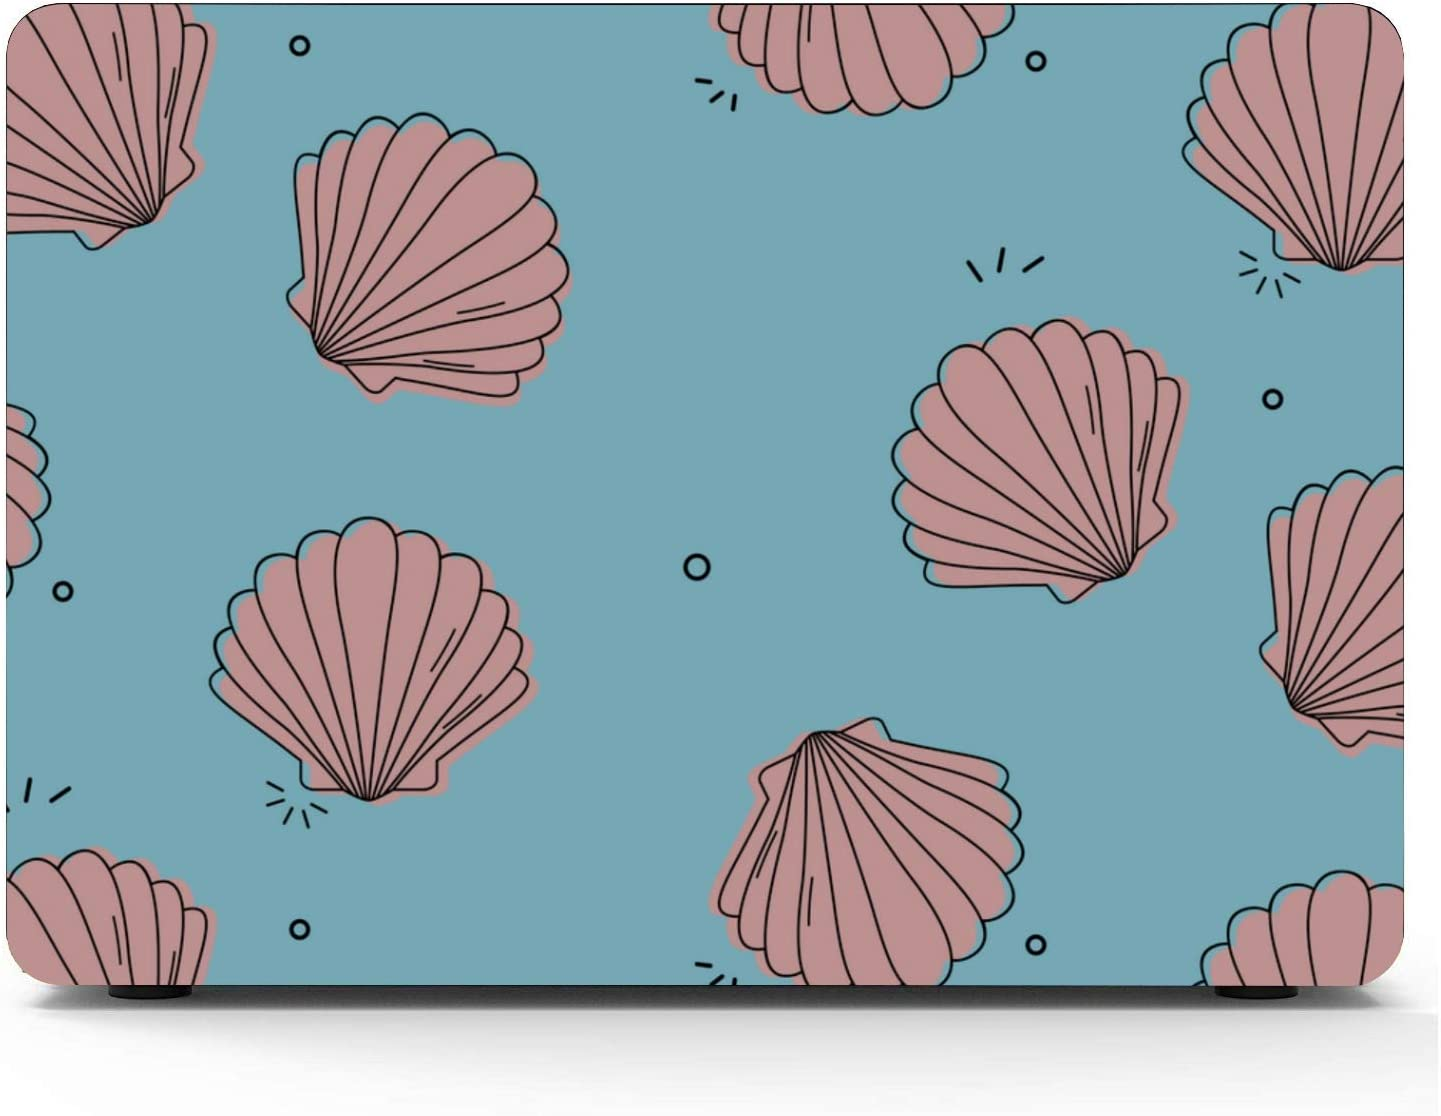 Case for MacBook Summer Seaside Seashells Starfish Plastic Hard Shell Compatible Mac Air 11 Pro 13 15 A1707 MacBook Pro Case Protection for MacBook 2016-2019 Version